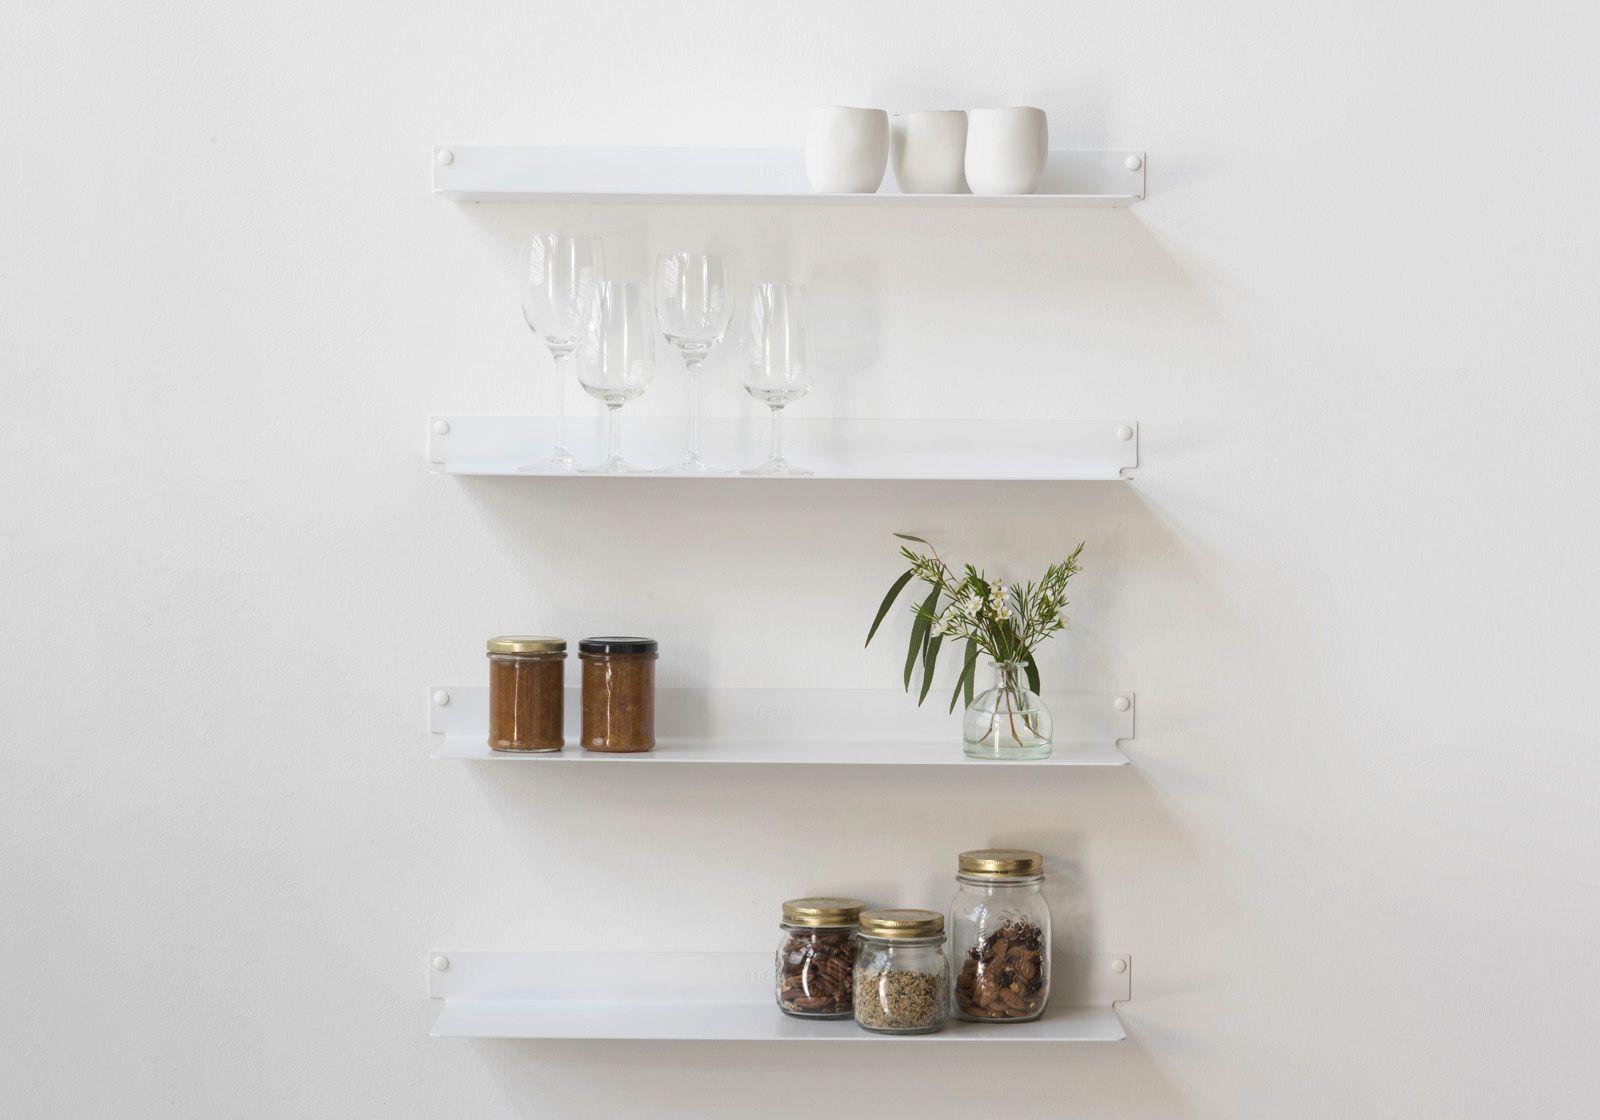 Mensole per cucina TEEline 60 cm - Set di 4 - Acciao